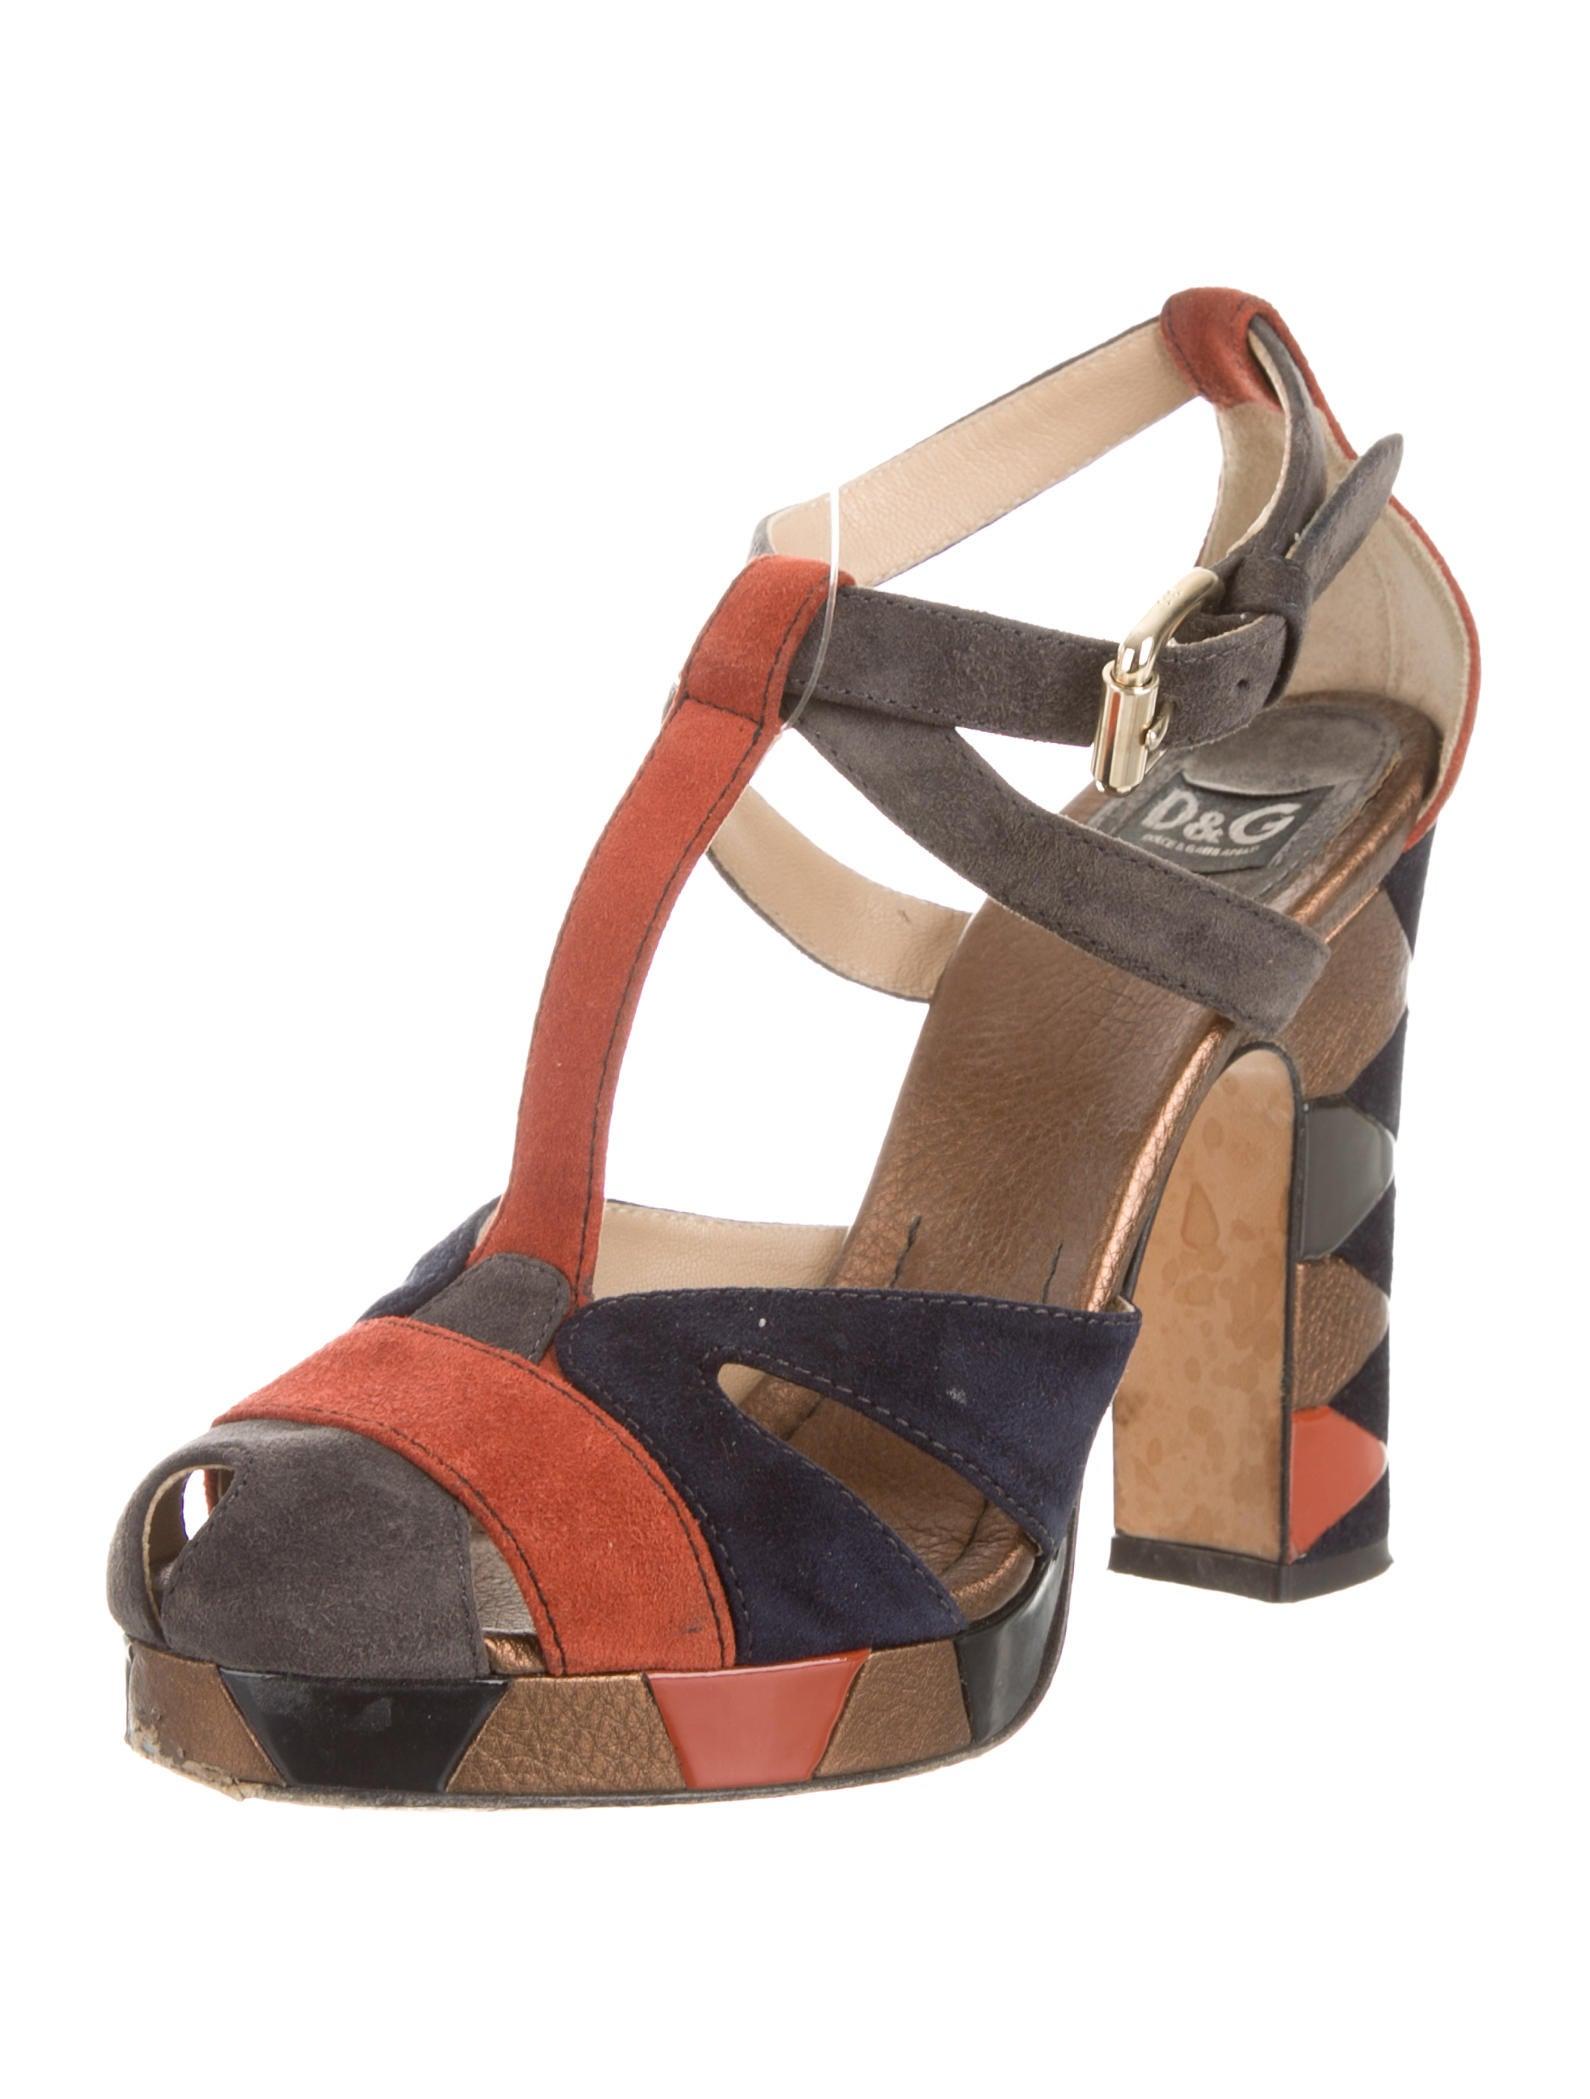 d g t strap pumps shoes wdg26801 the realreal. Black Bedroom Furniture Sets. Home Design Ideas